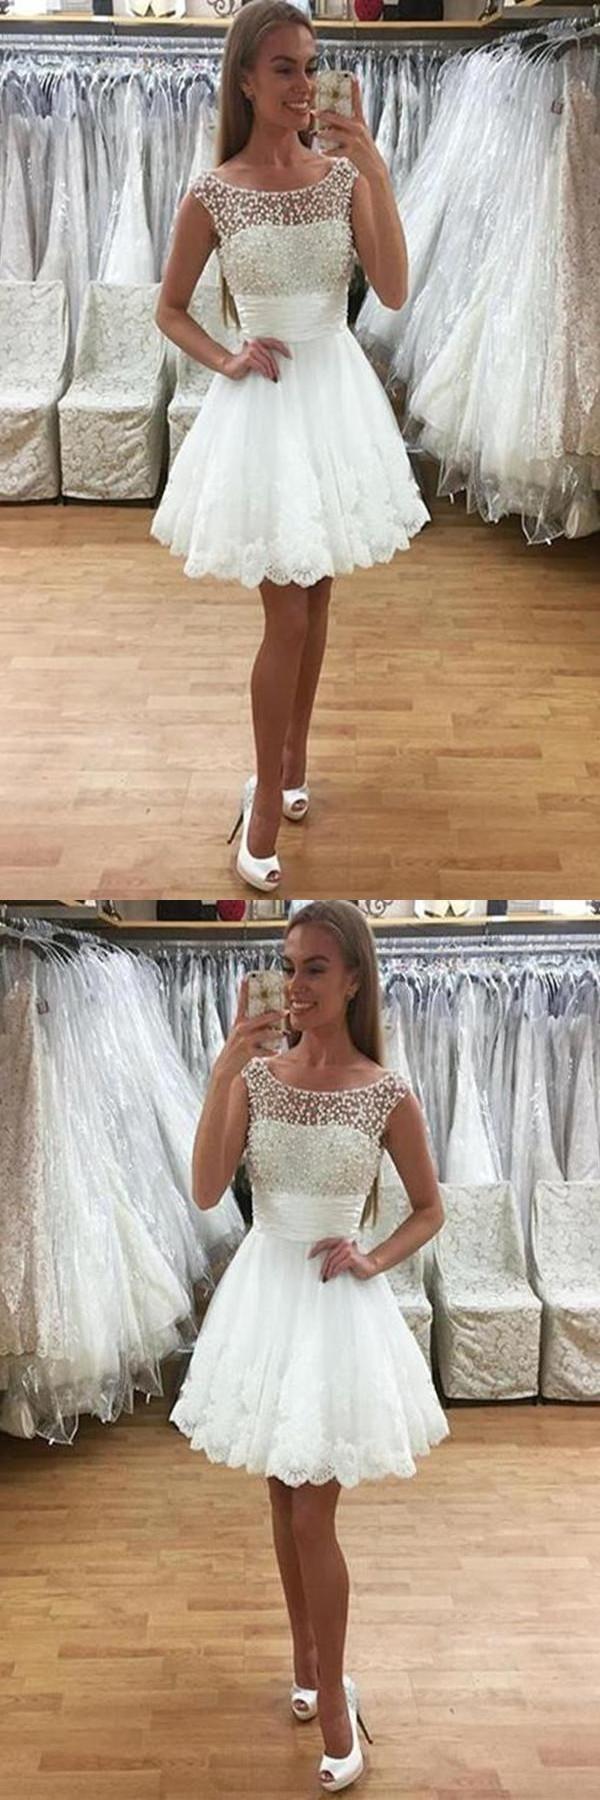 Customized morden prom dresses short white tulle a line beading